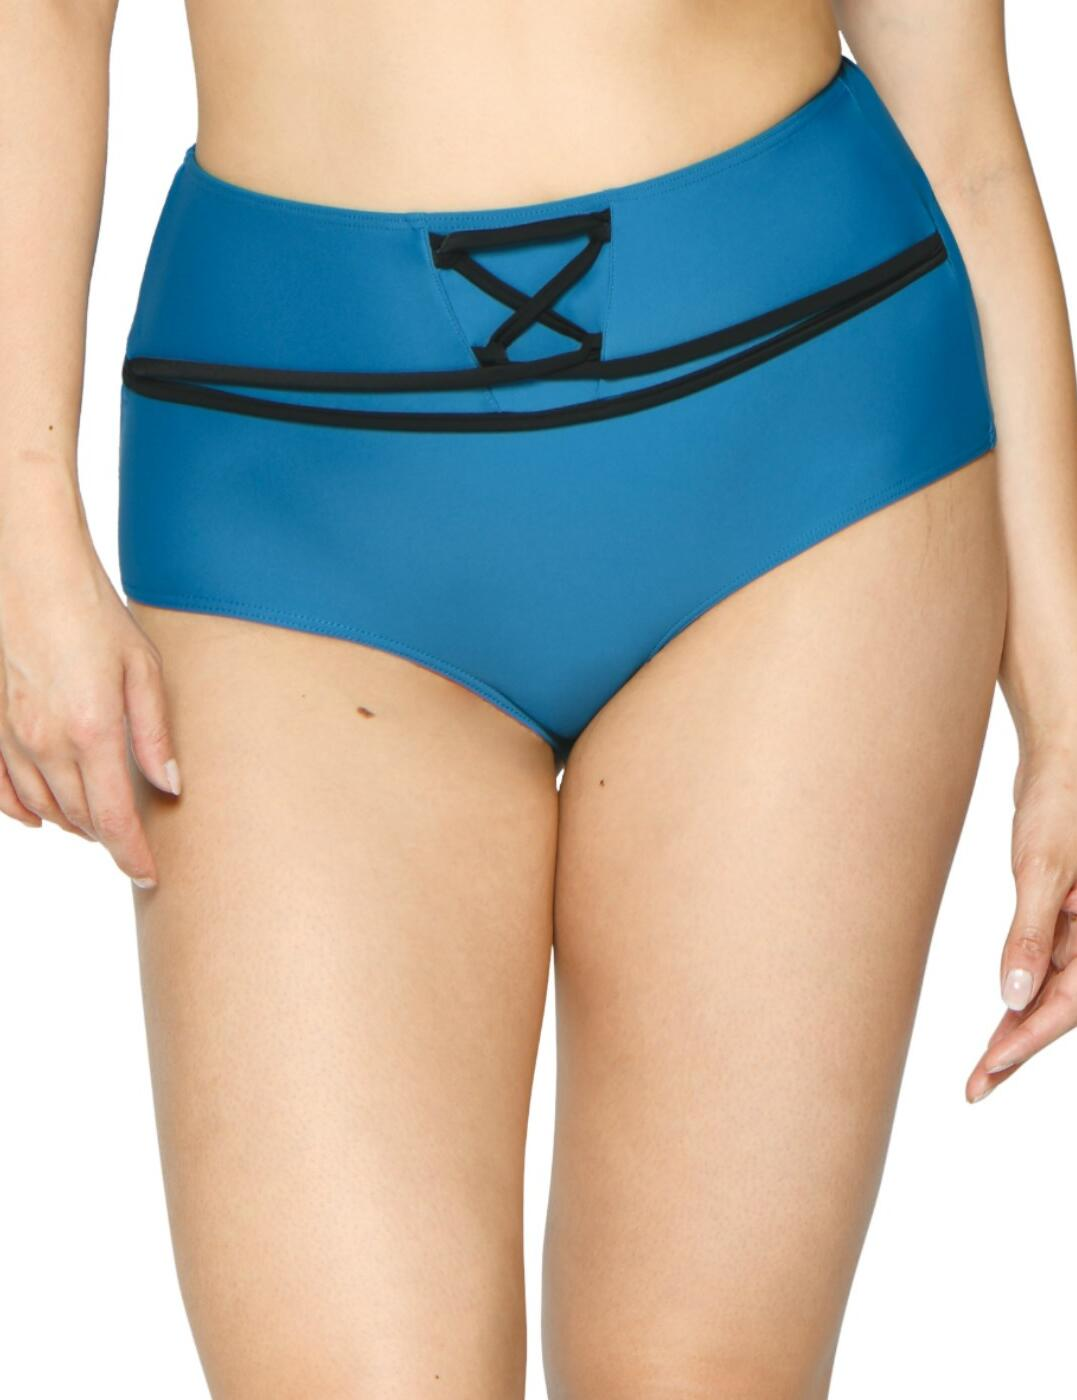 CS002505 Curvy Kate Rock The Pool High Waist Bikini Brief - CS002505 Petrol